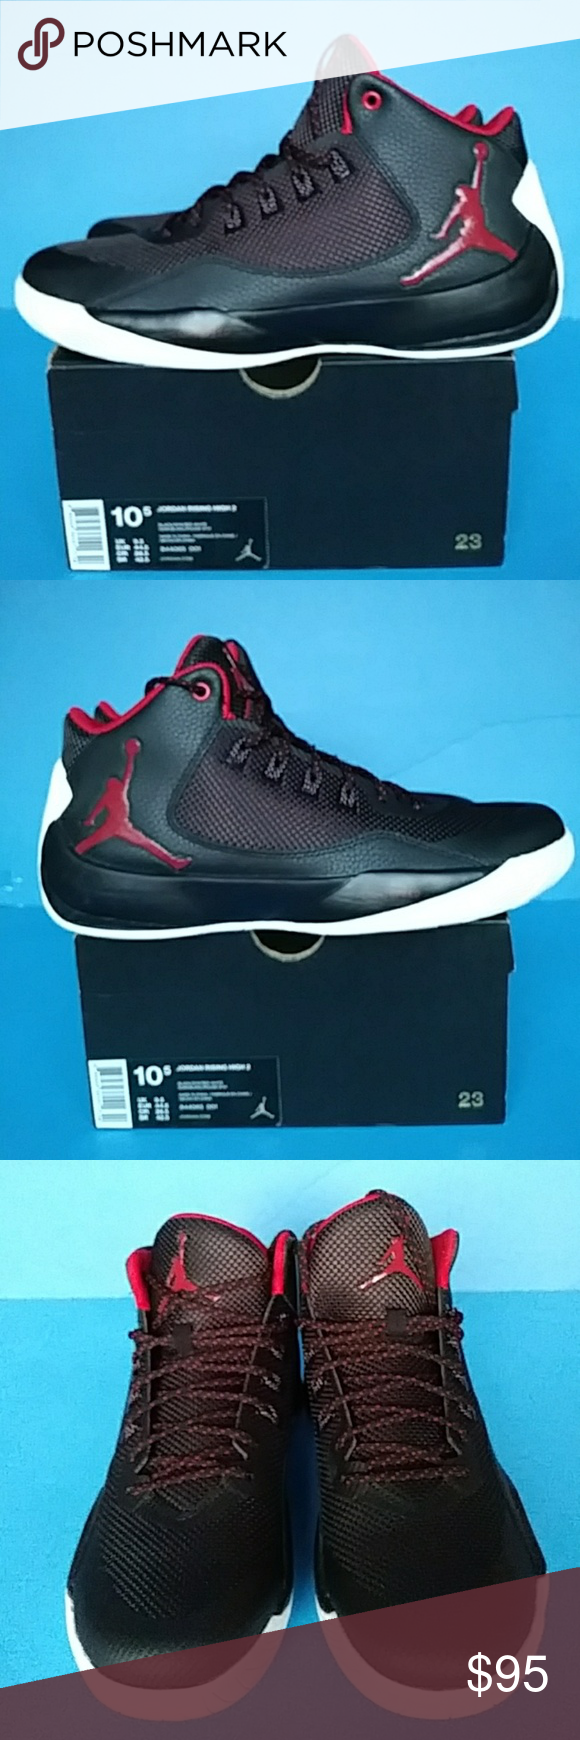 Men's Sneaker Brand Jordan Rising 100 Air Authentic New qFUp4